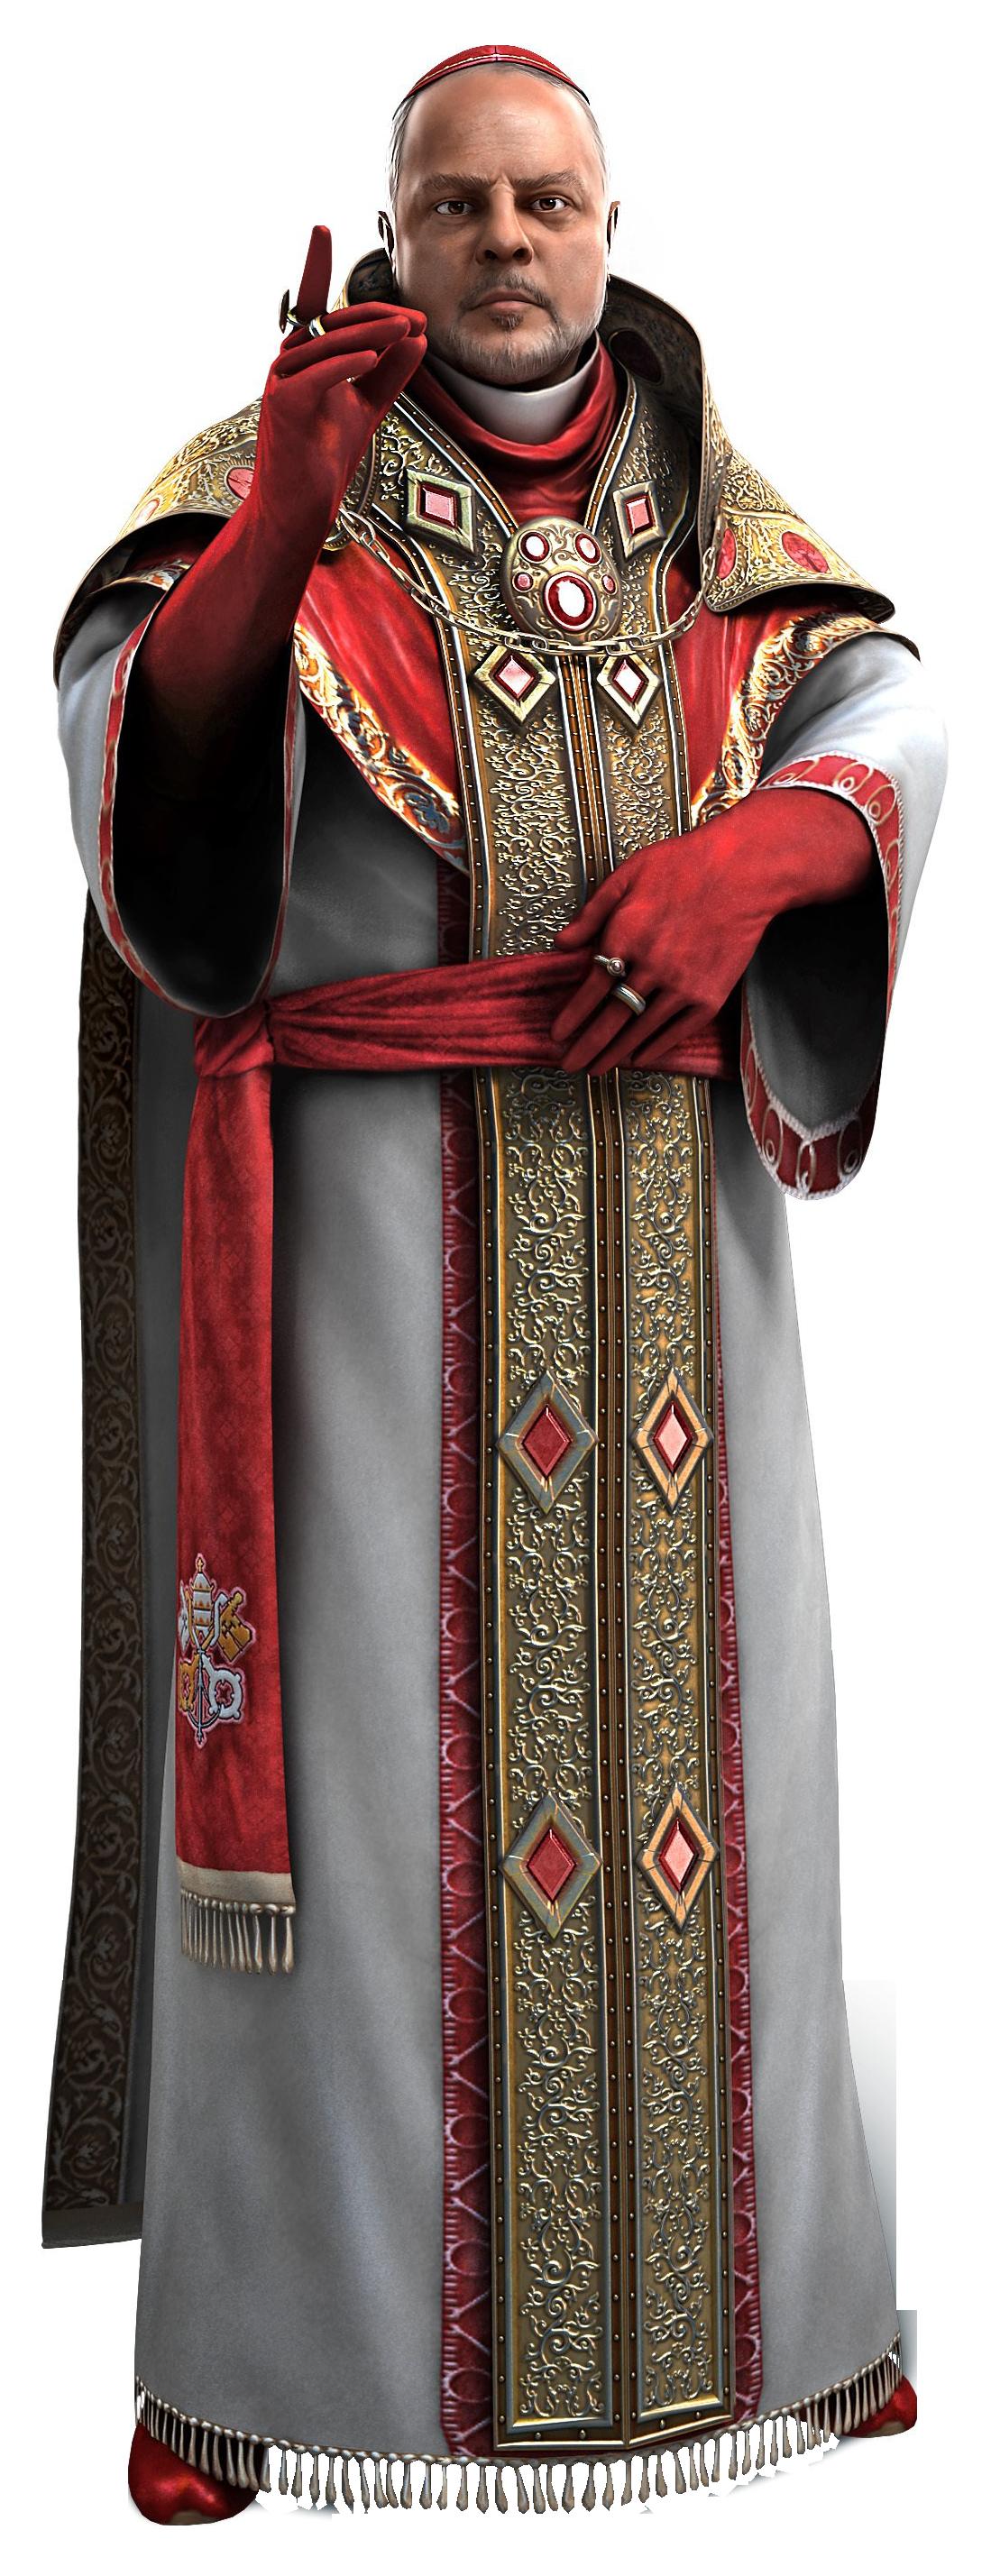 Rodrigo Borgia - Assassin's Creed Wiki - Wikia